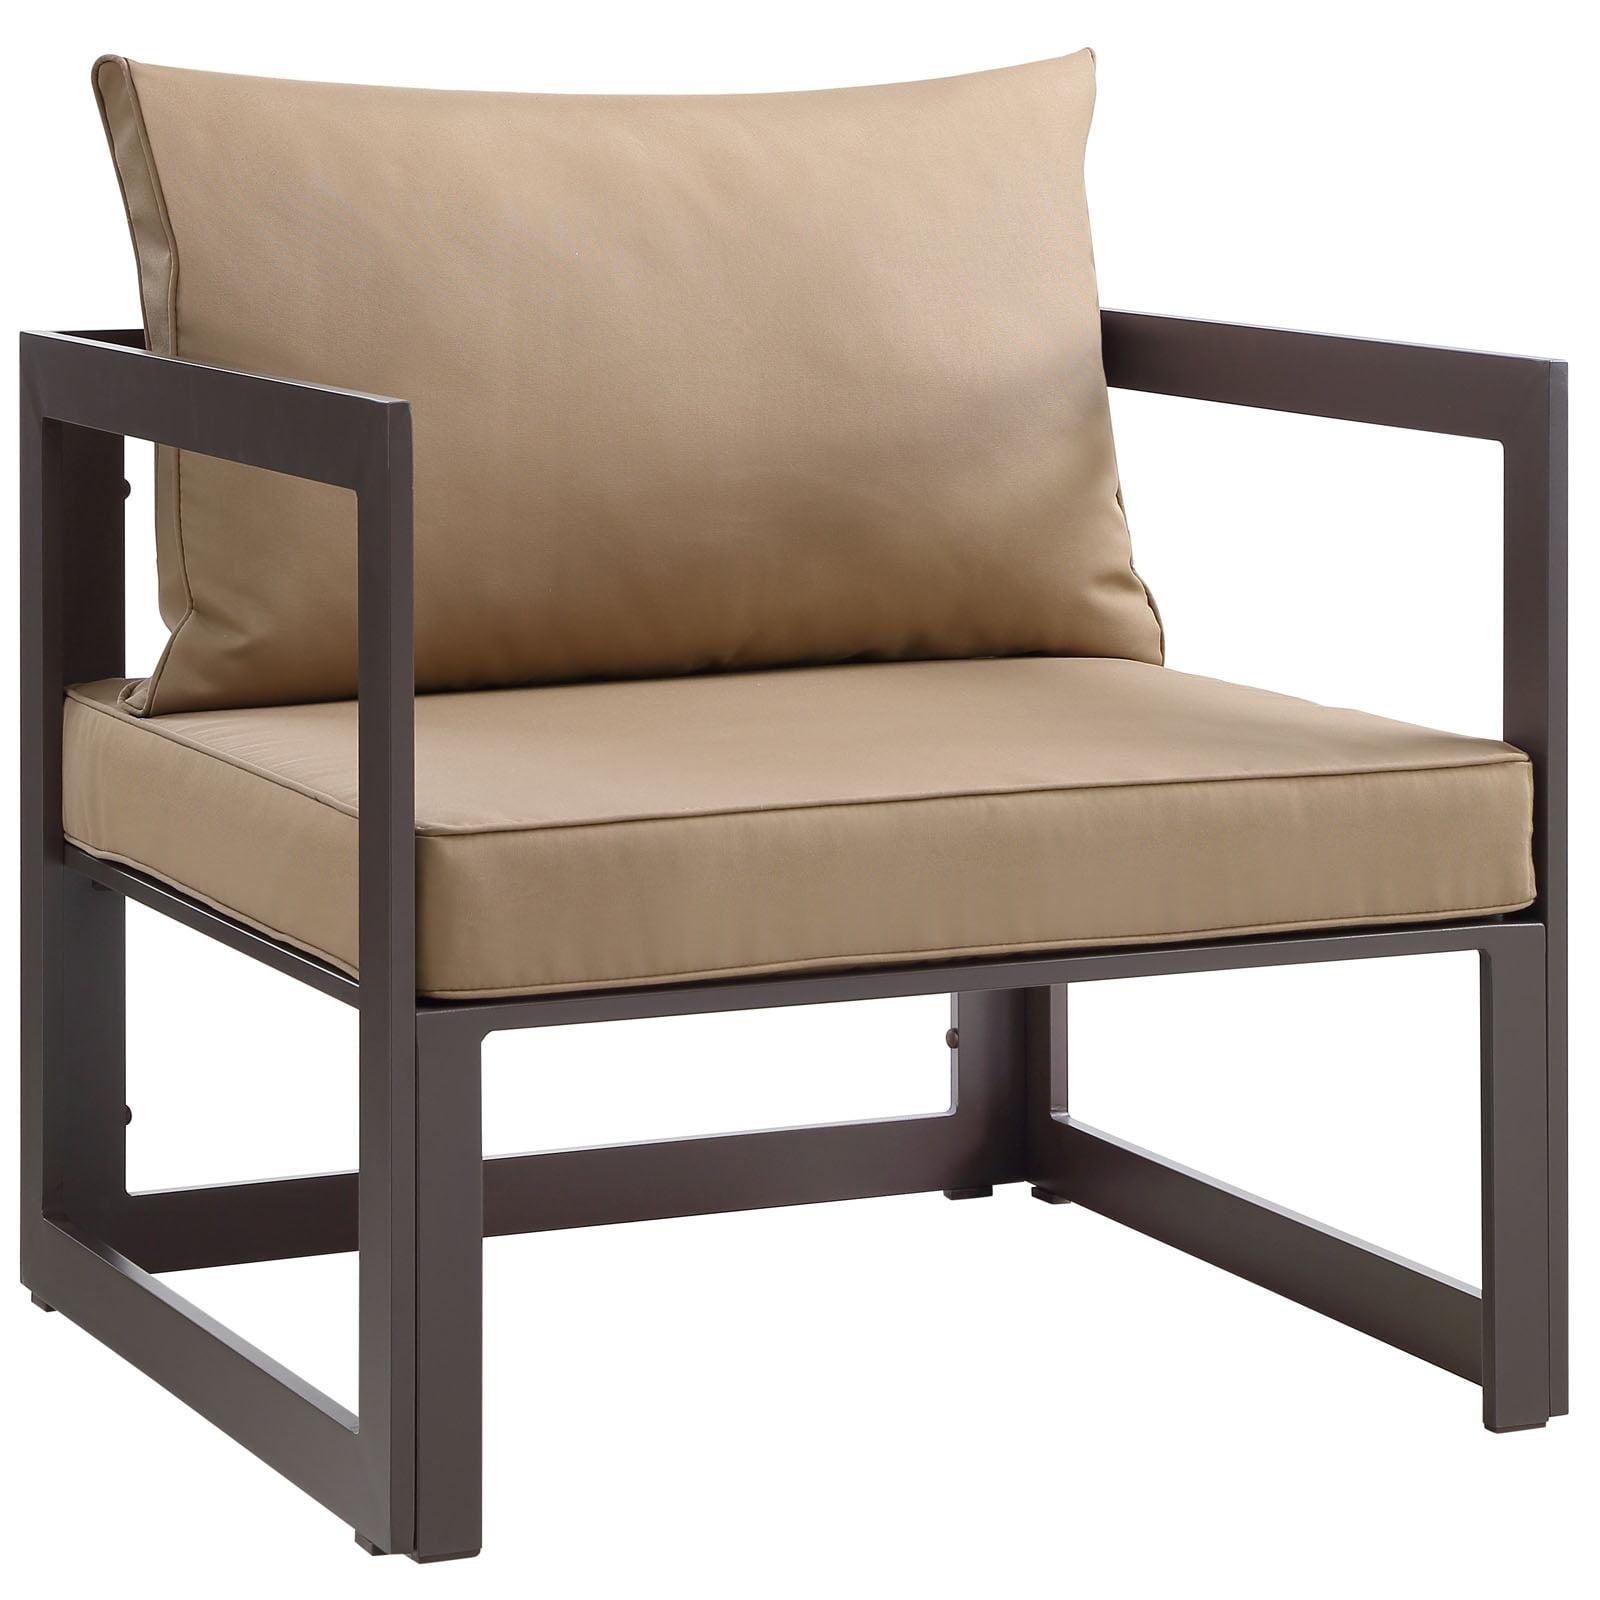 Modern Urban Contemporary Outdoor Patio Armchair, Brown Fabric Steel